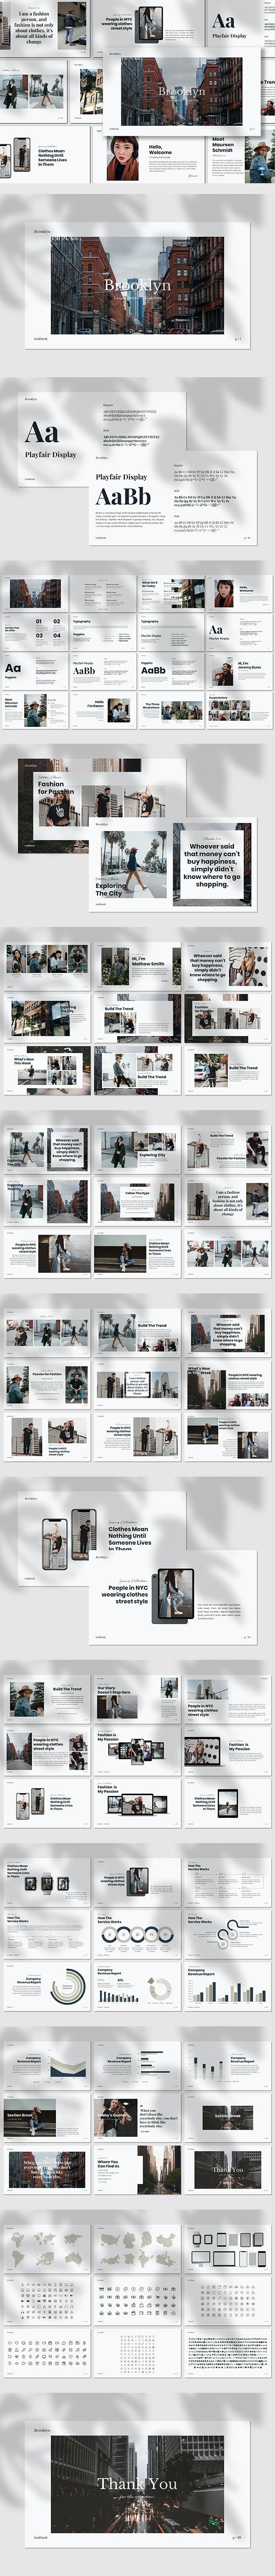 Brooklyn - Lookbook Keynote Template - Creative Keynote Templates